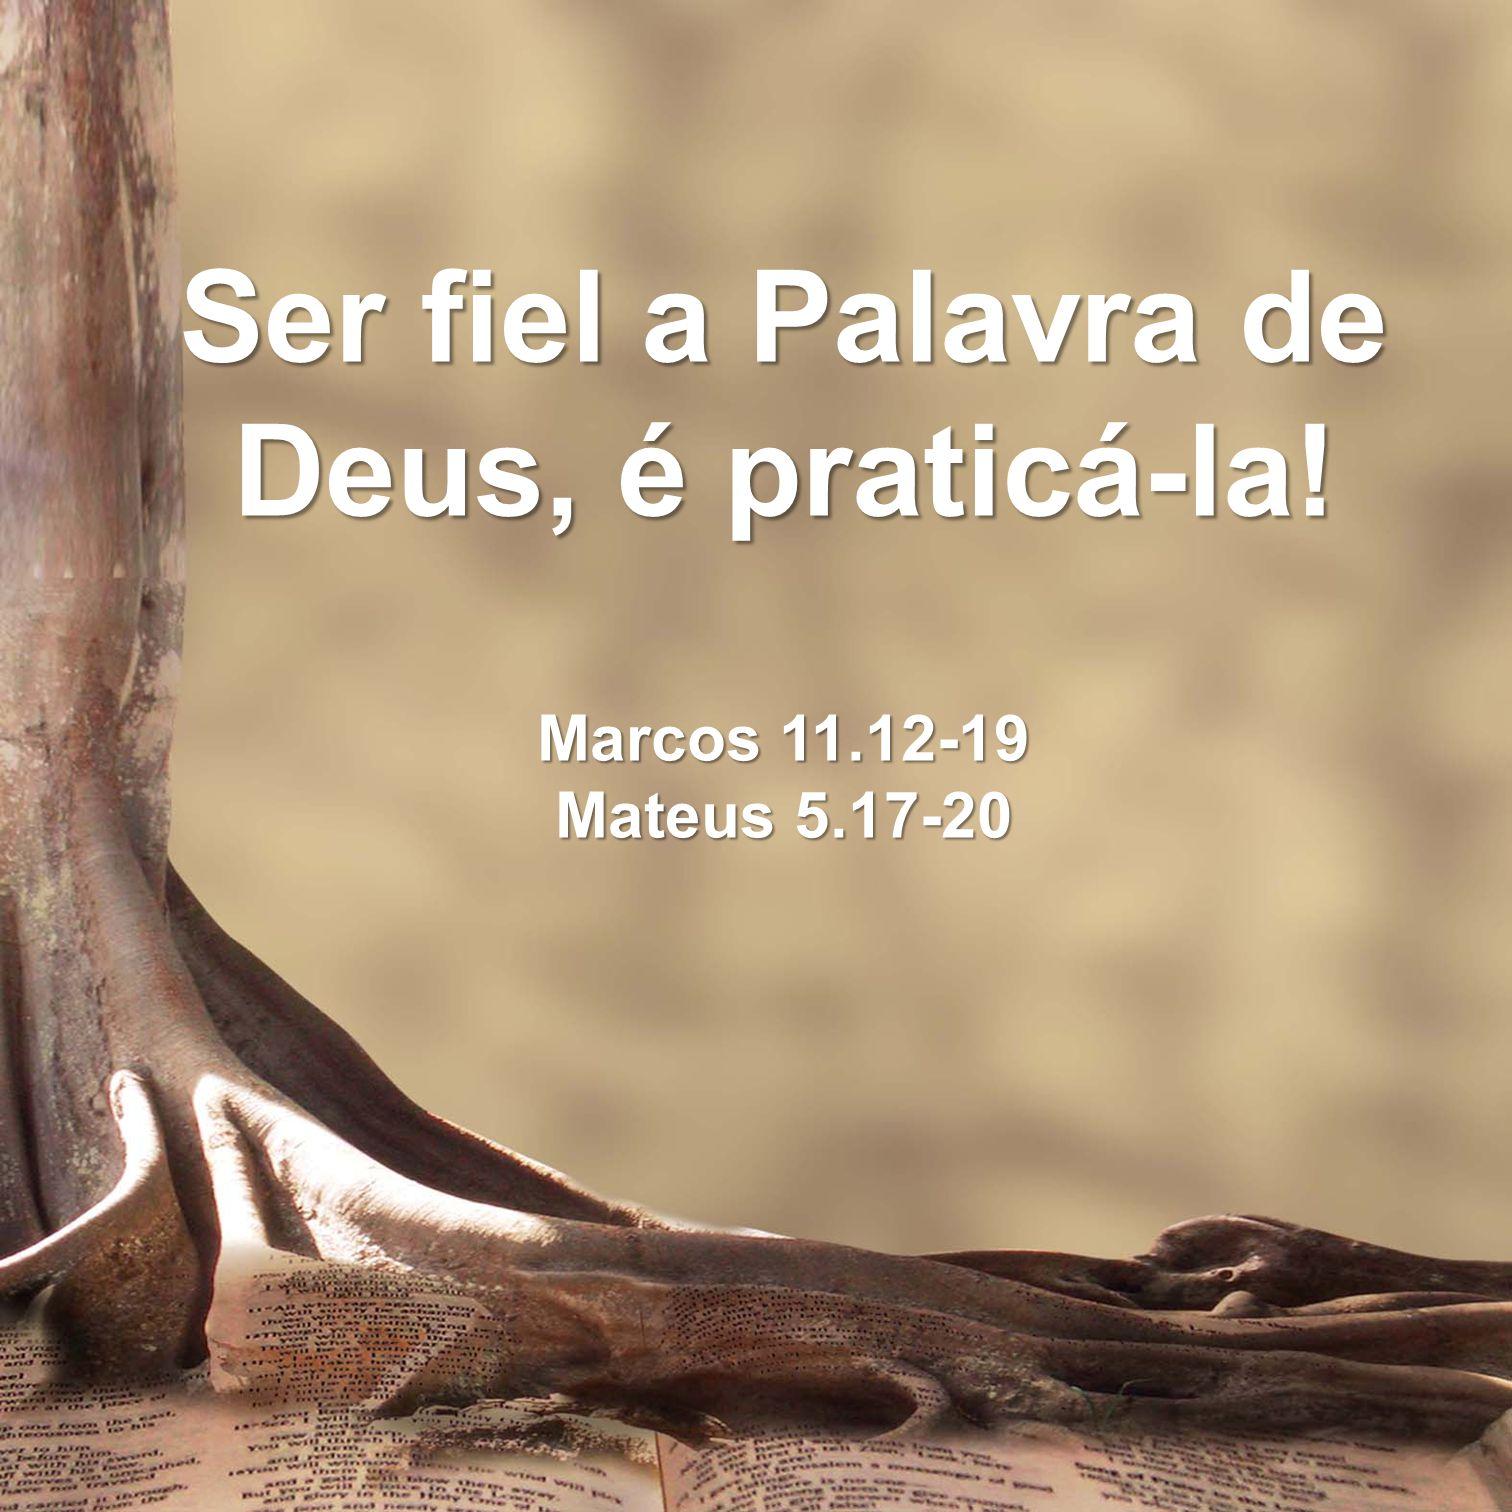 Ser fiel a Palavra de Deus, é praticá-la. Marcos 11. 12-19 Mateus 5